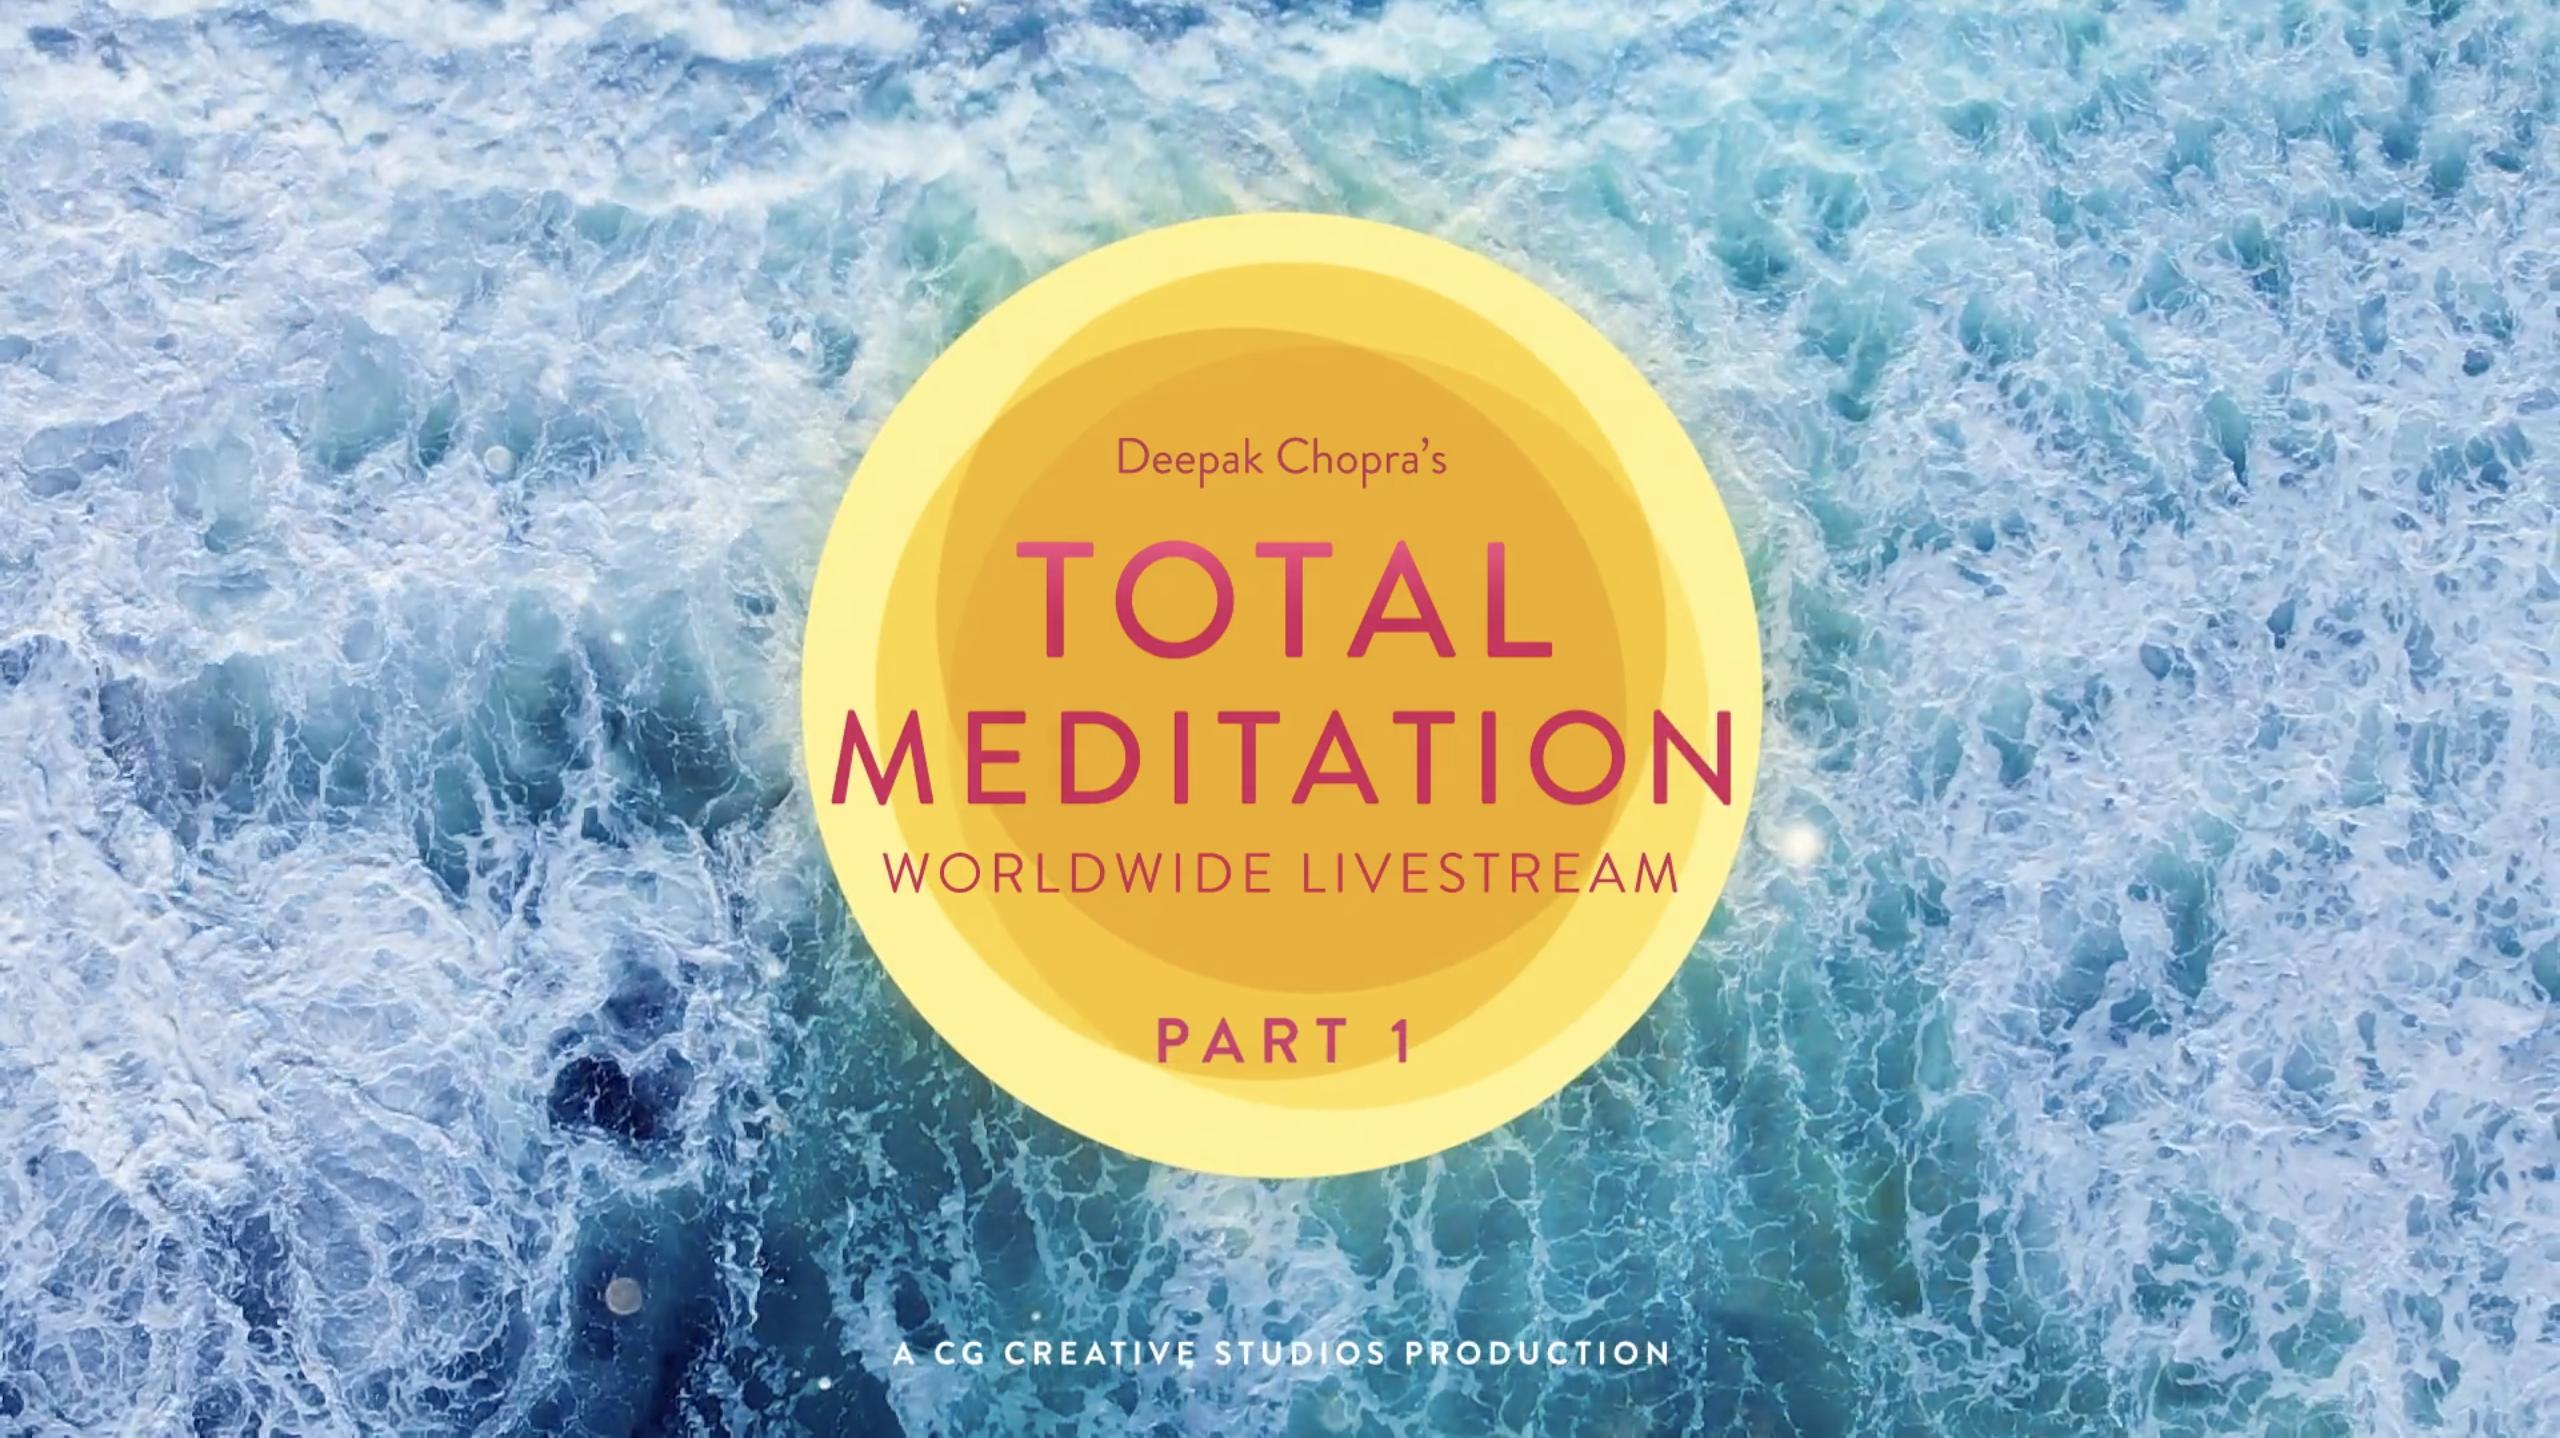 Total Meditation Worldwide Livestream